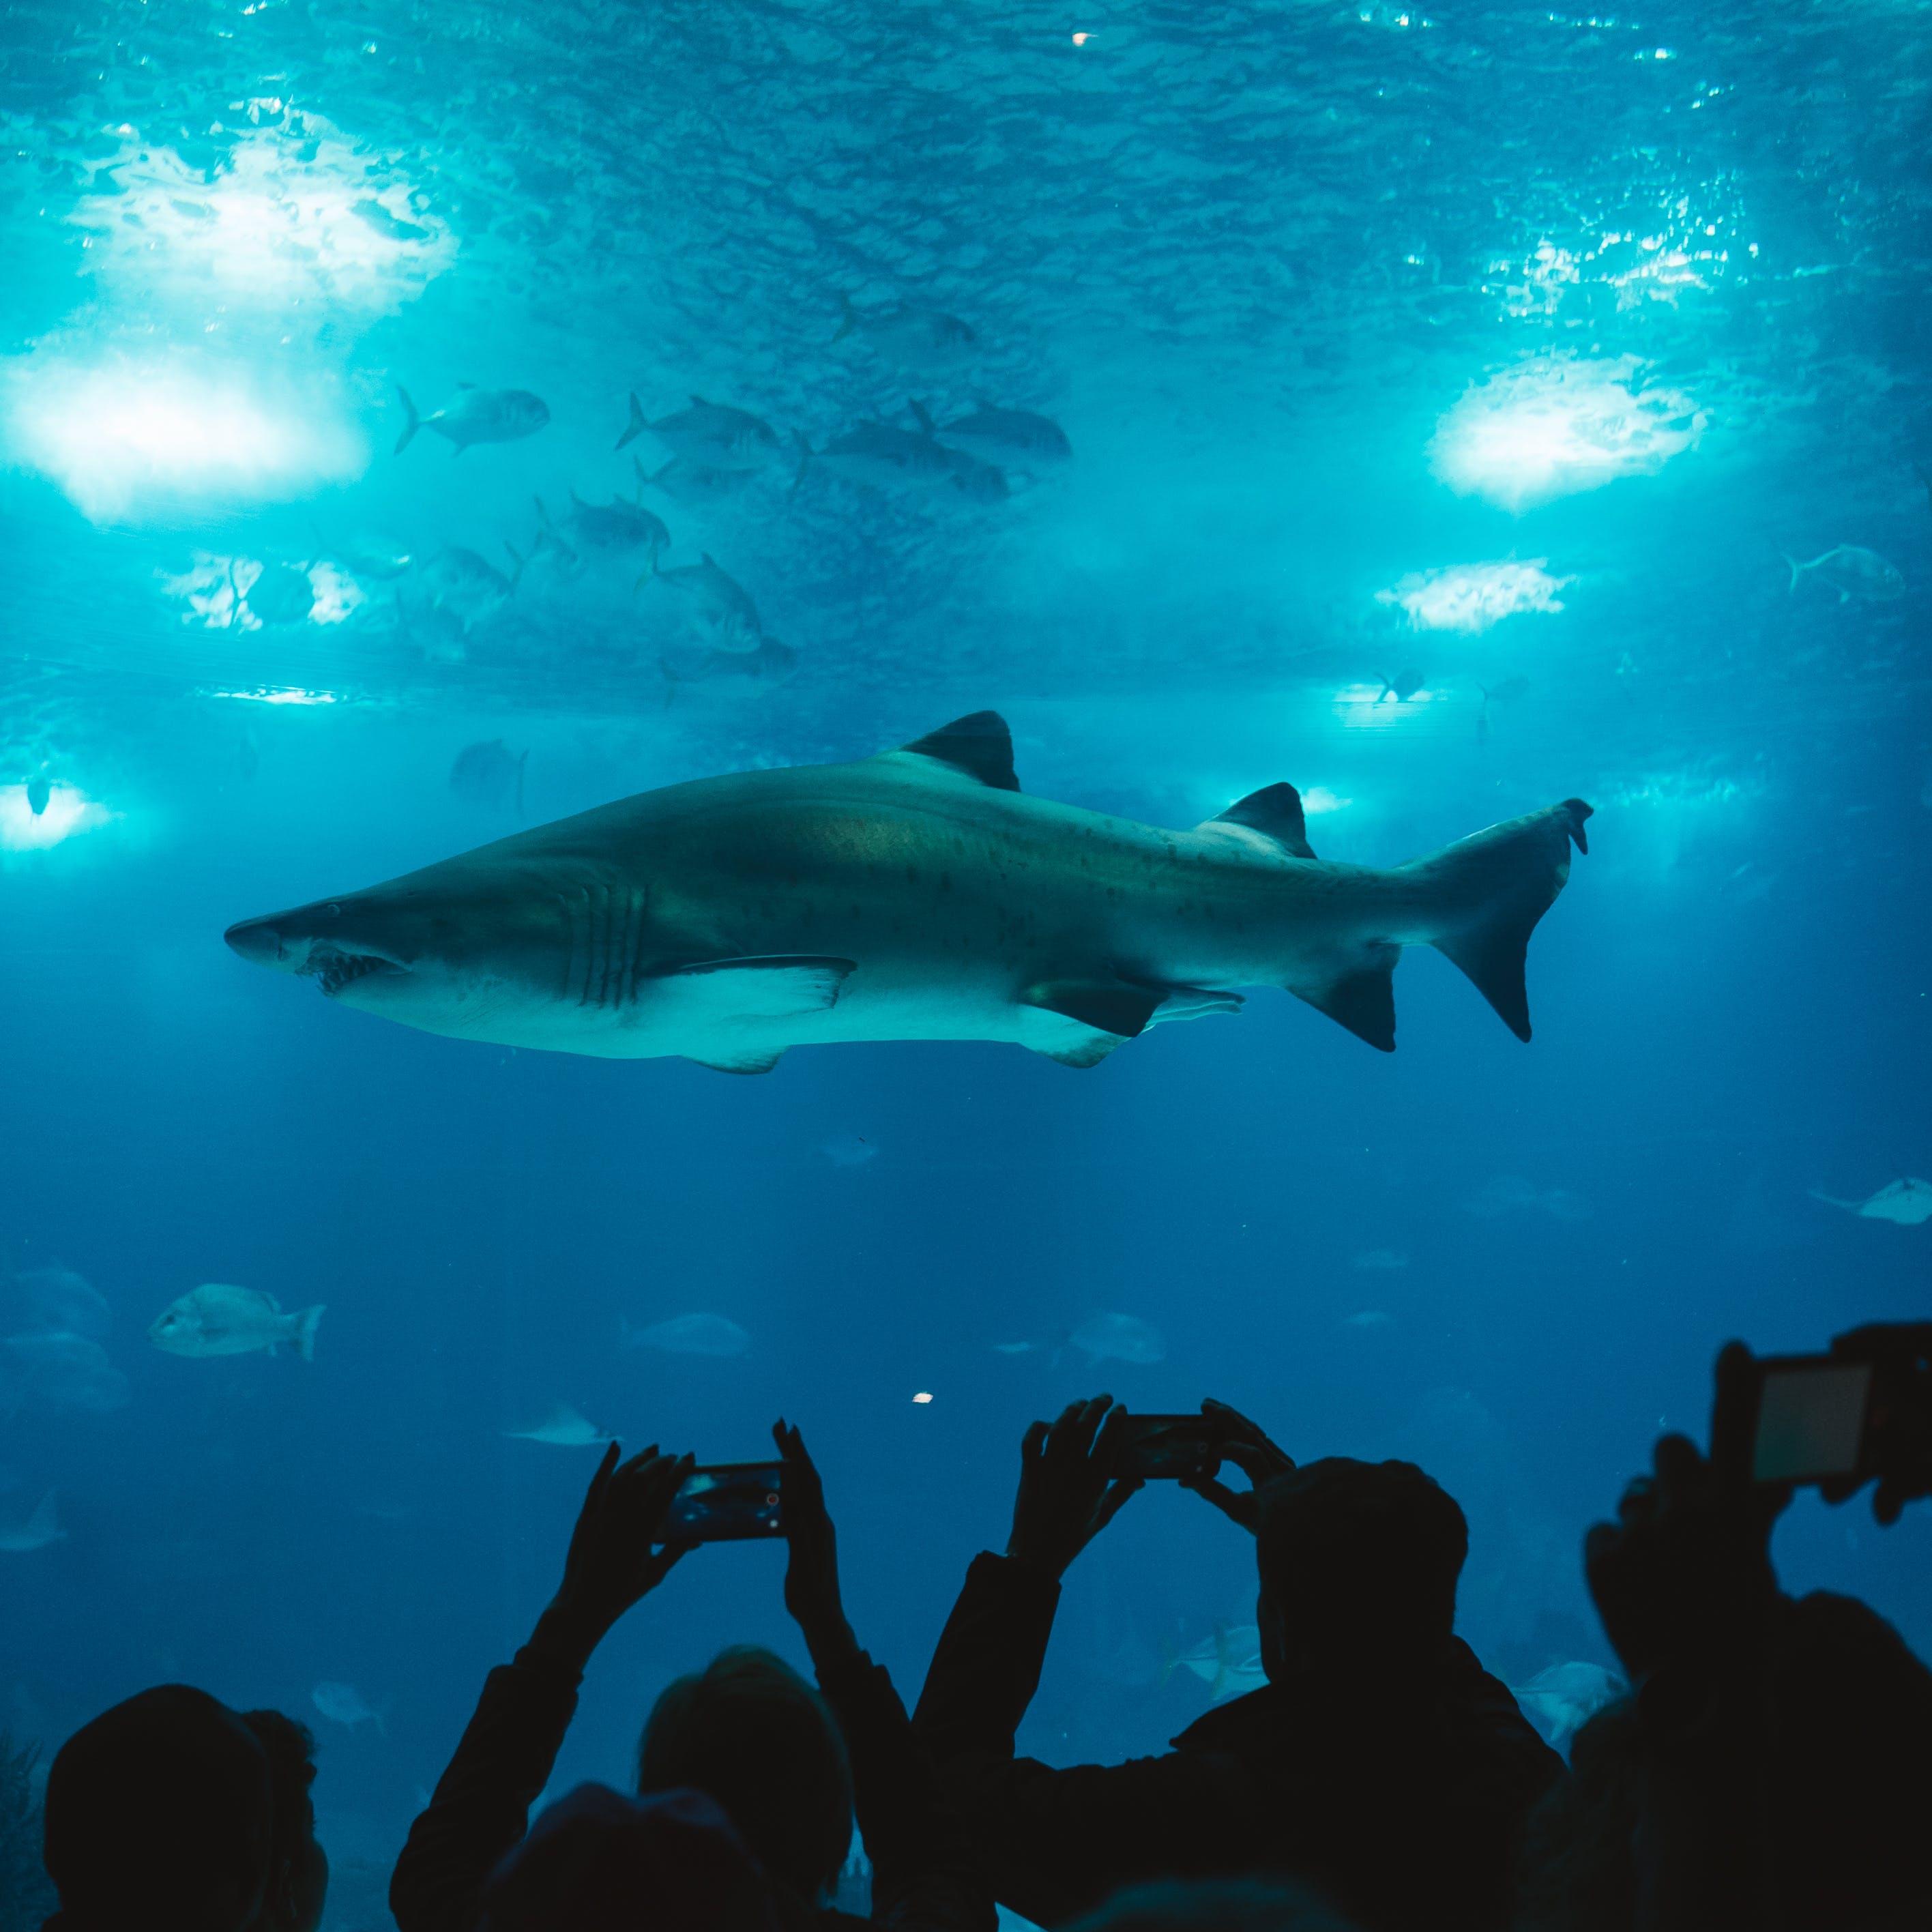 акваріум, акула, вода